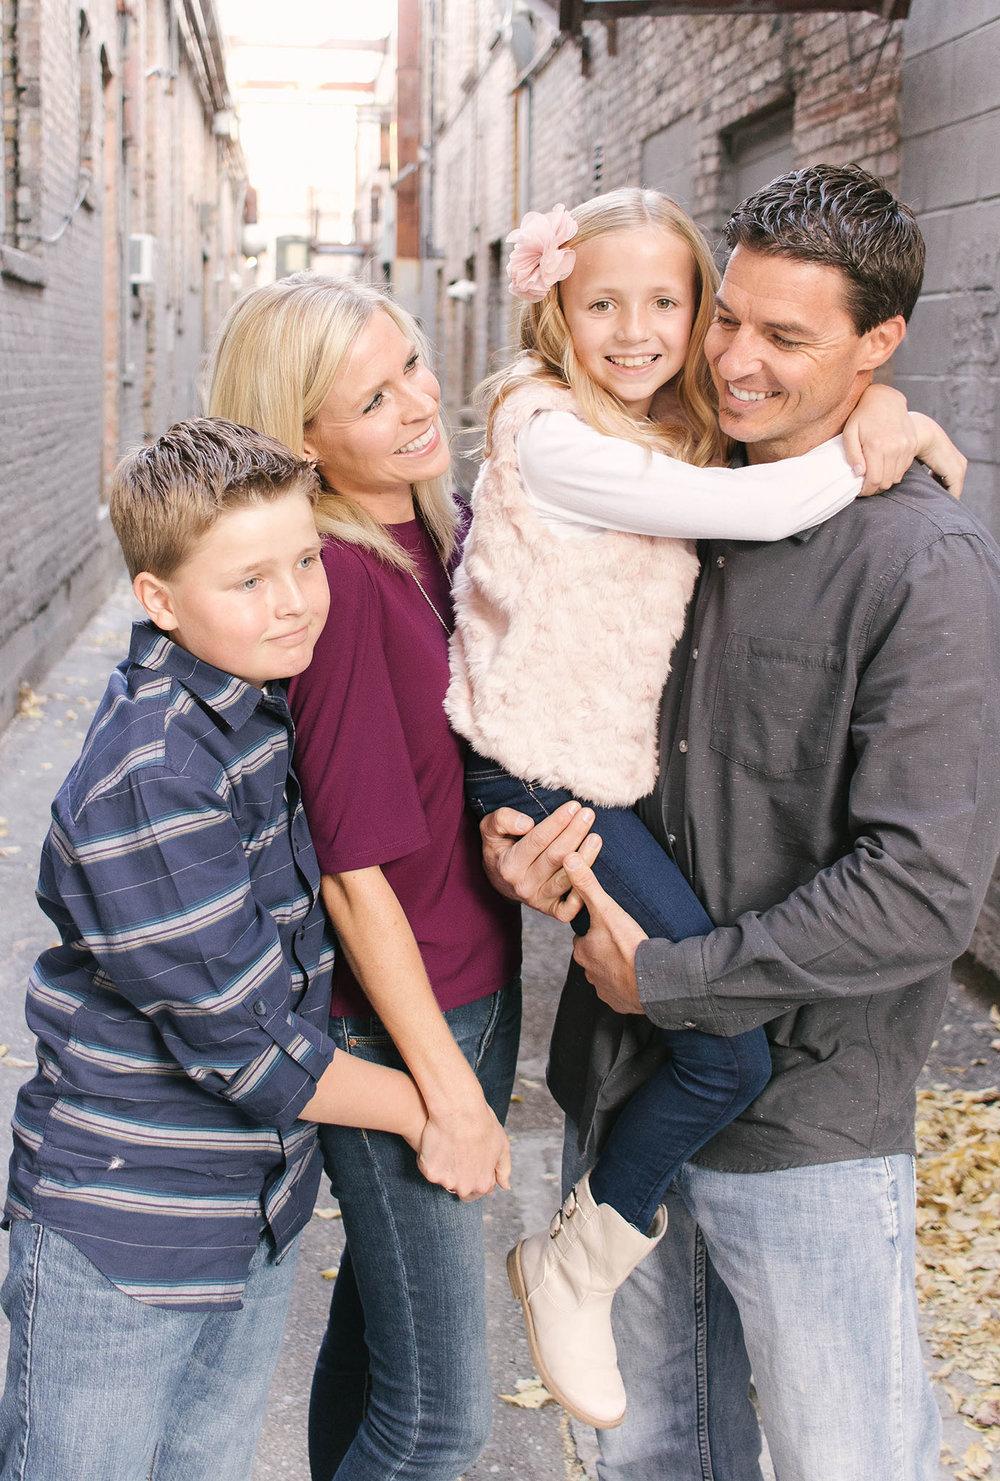 Family-of-four-photo-idea.jpg